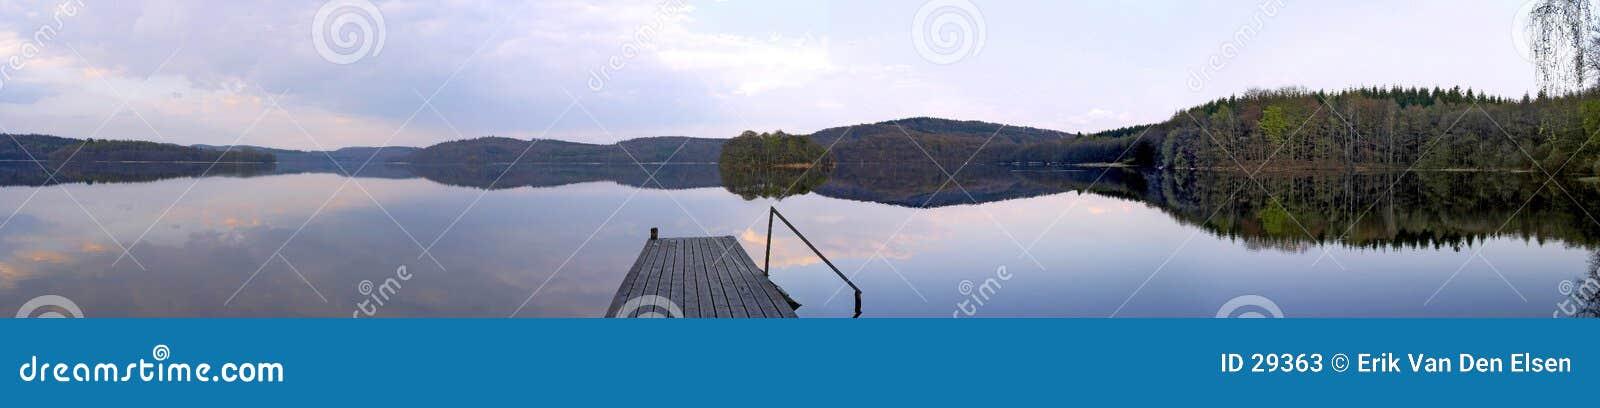 Lake panorama Szwecji